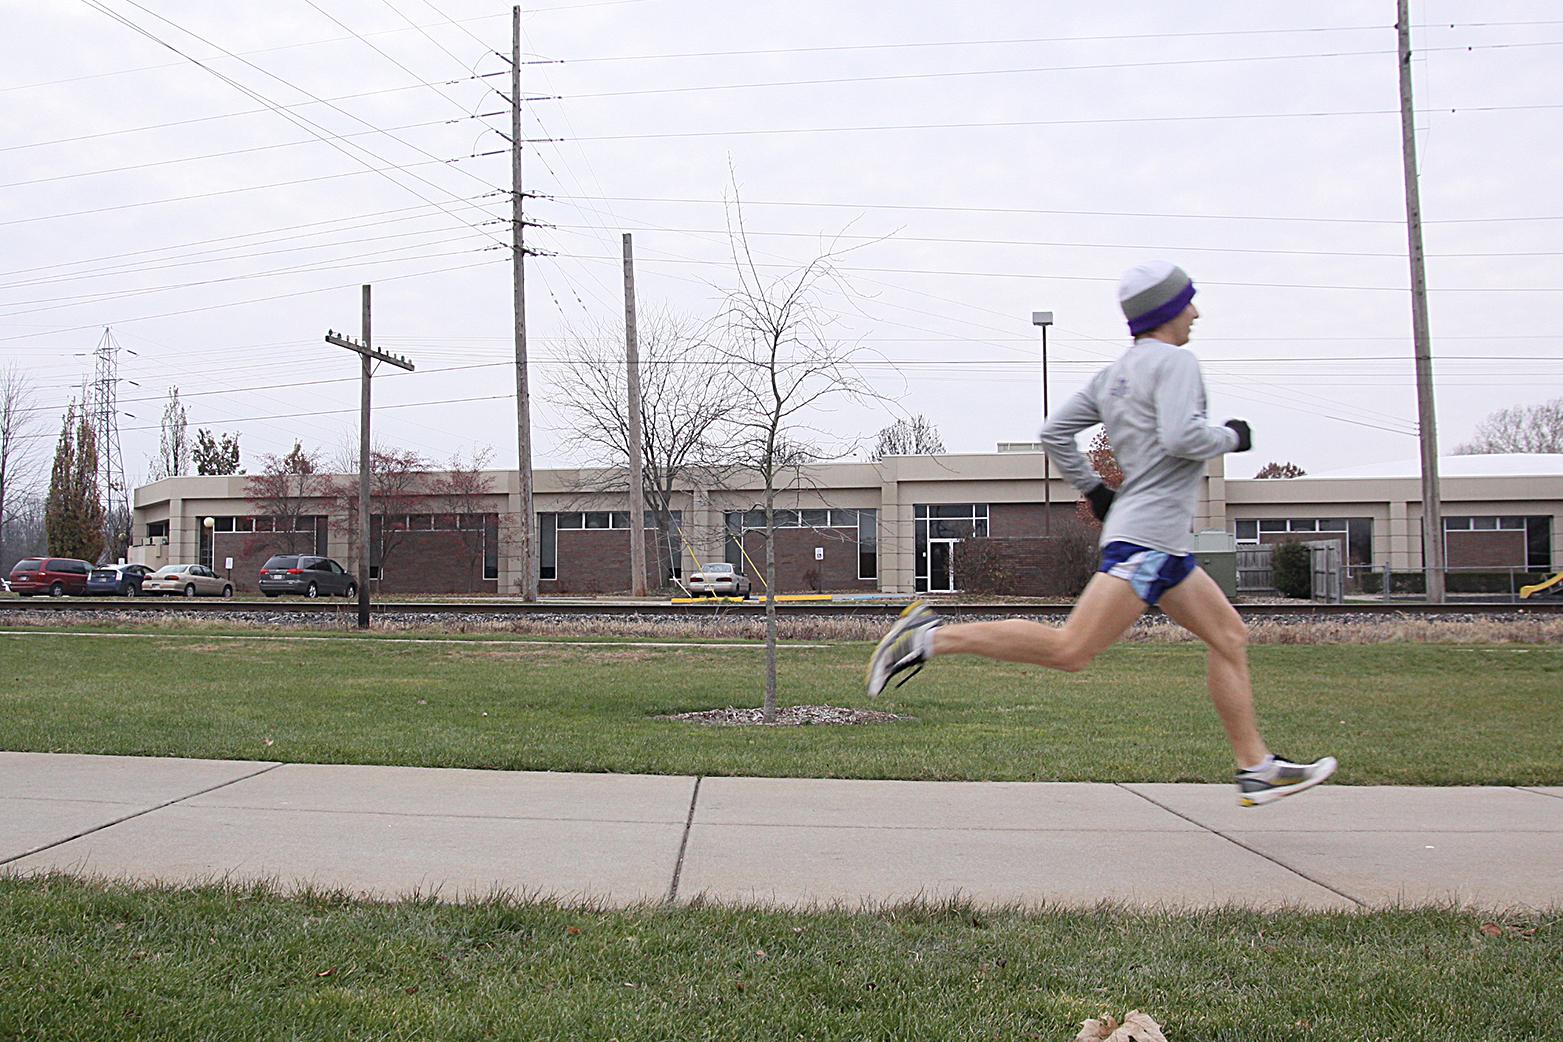 Ryan Smith runs down a path on the Goshen College campus